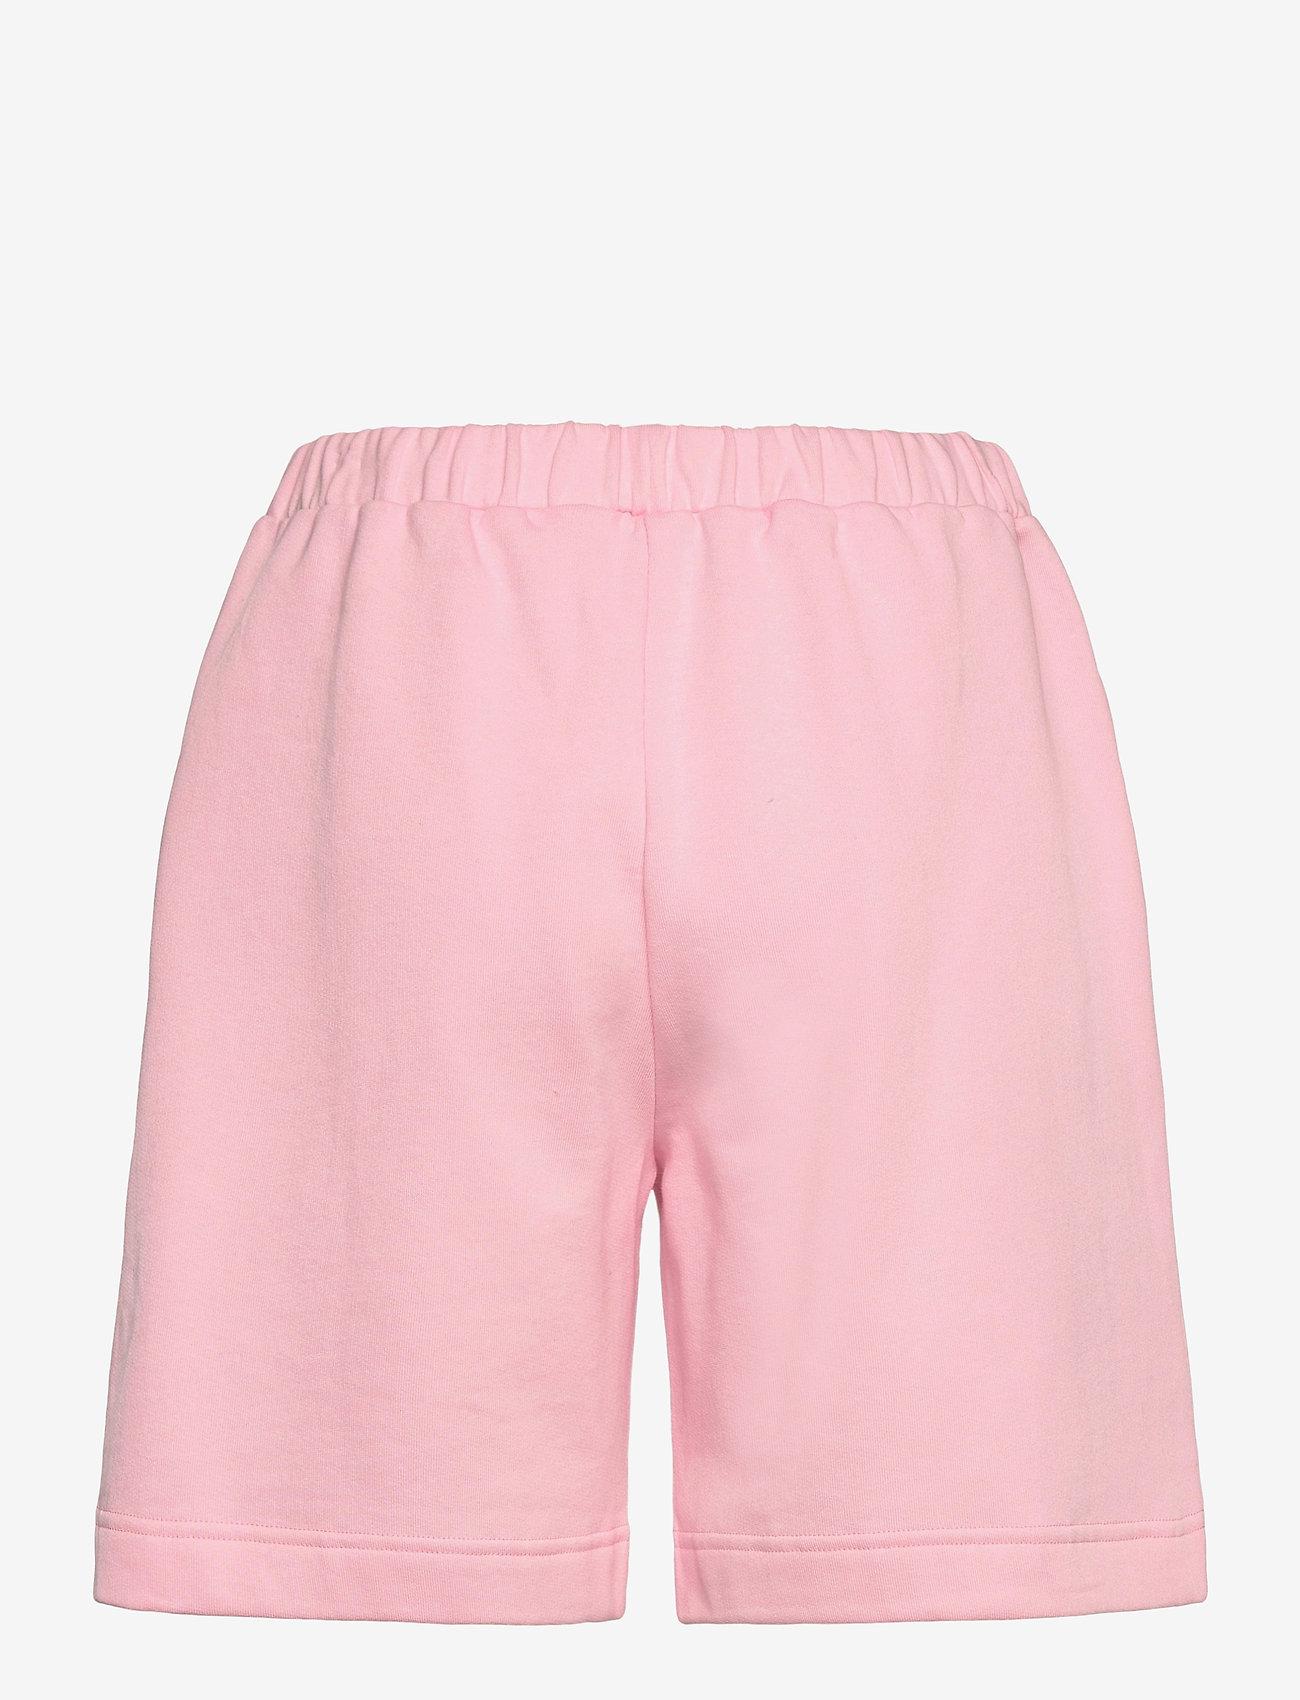 STINE GOYA - Signe, 1209 Tracksuit Goya - shorts casual - pink - 1